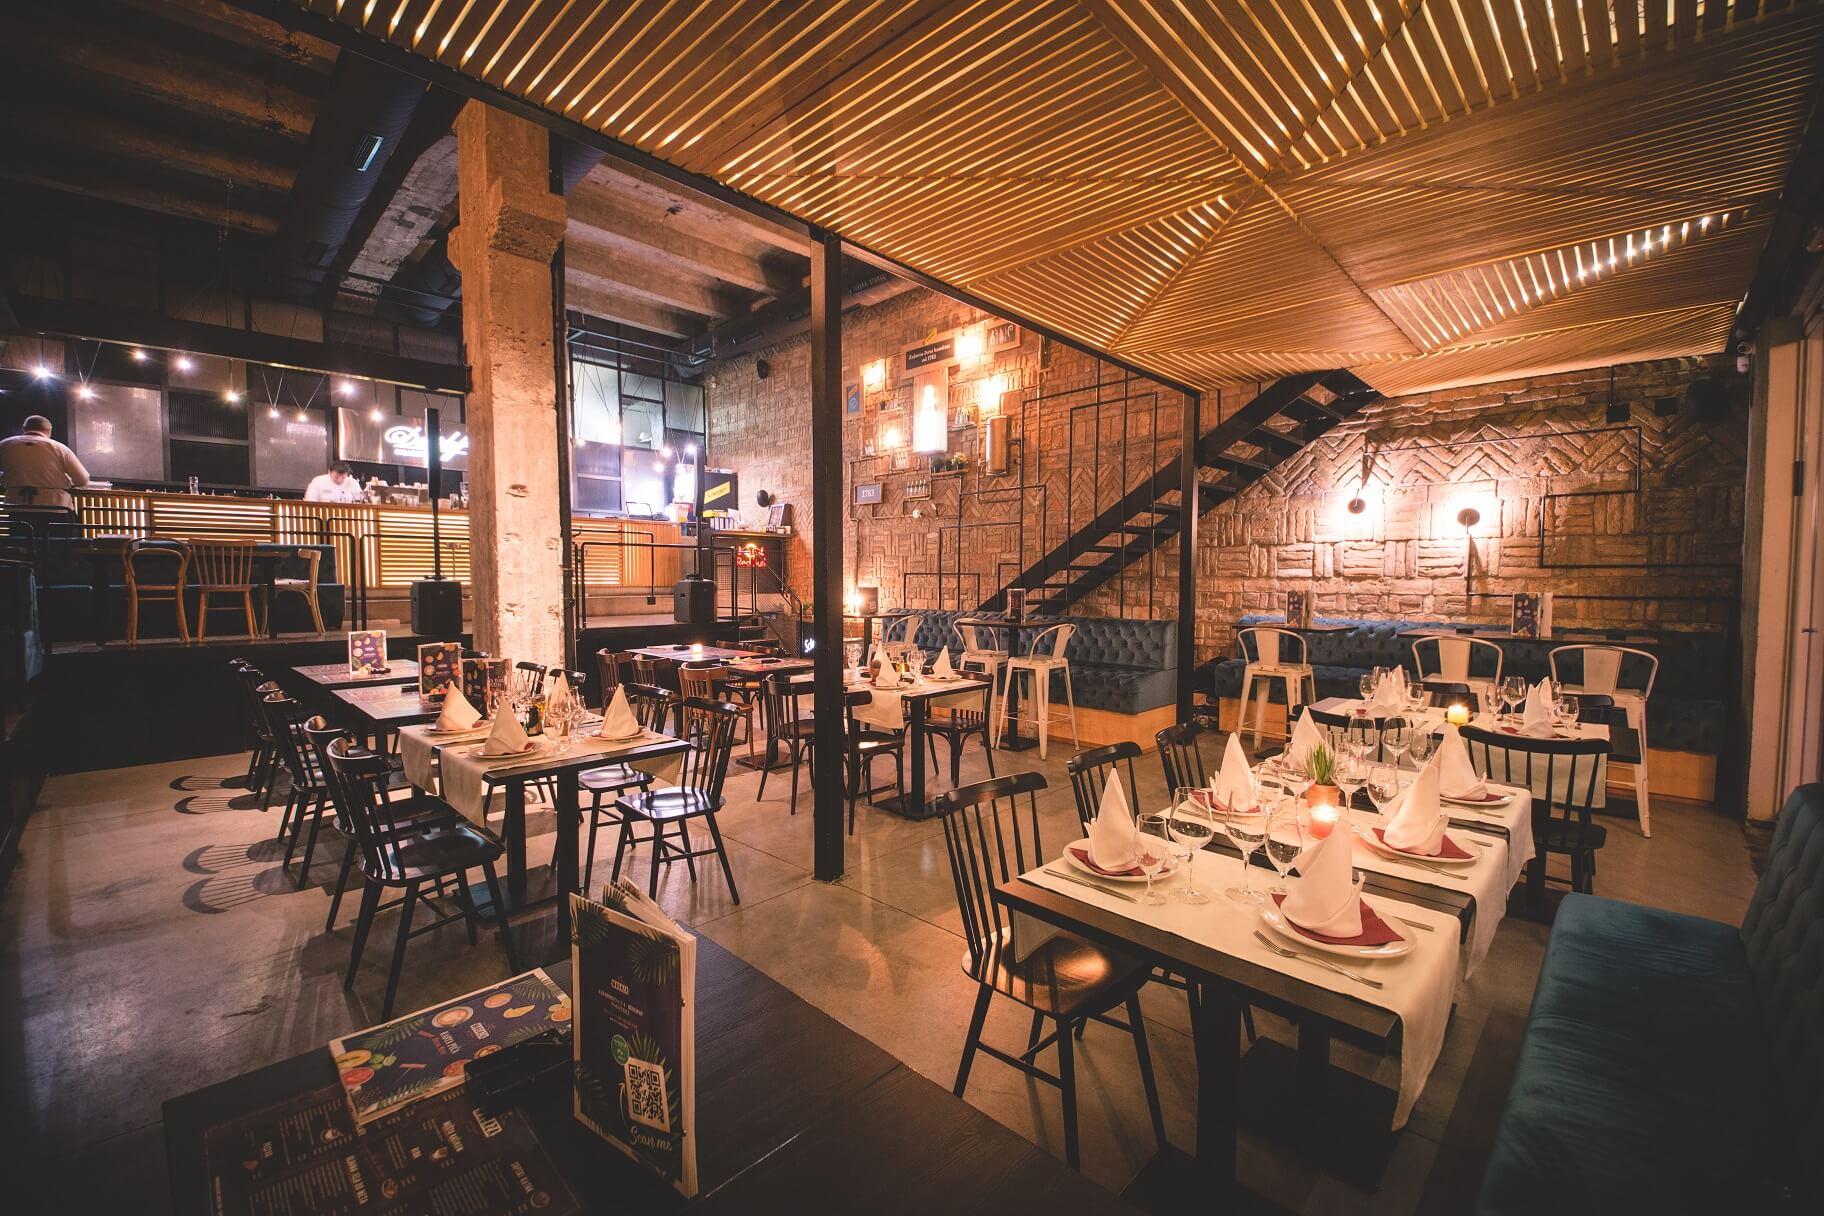 restoran magaza beton hala nova godina 2